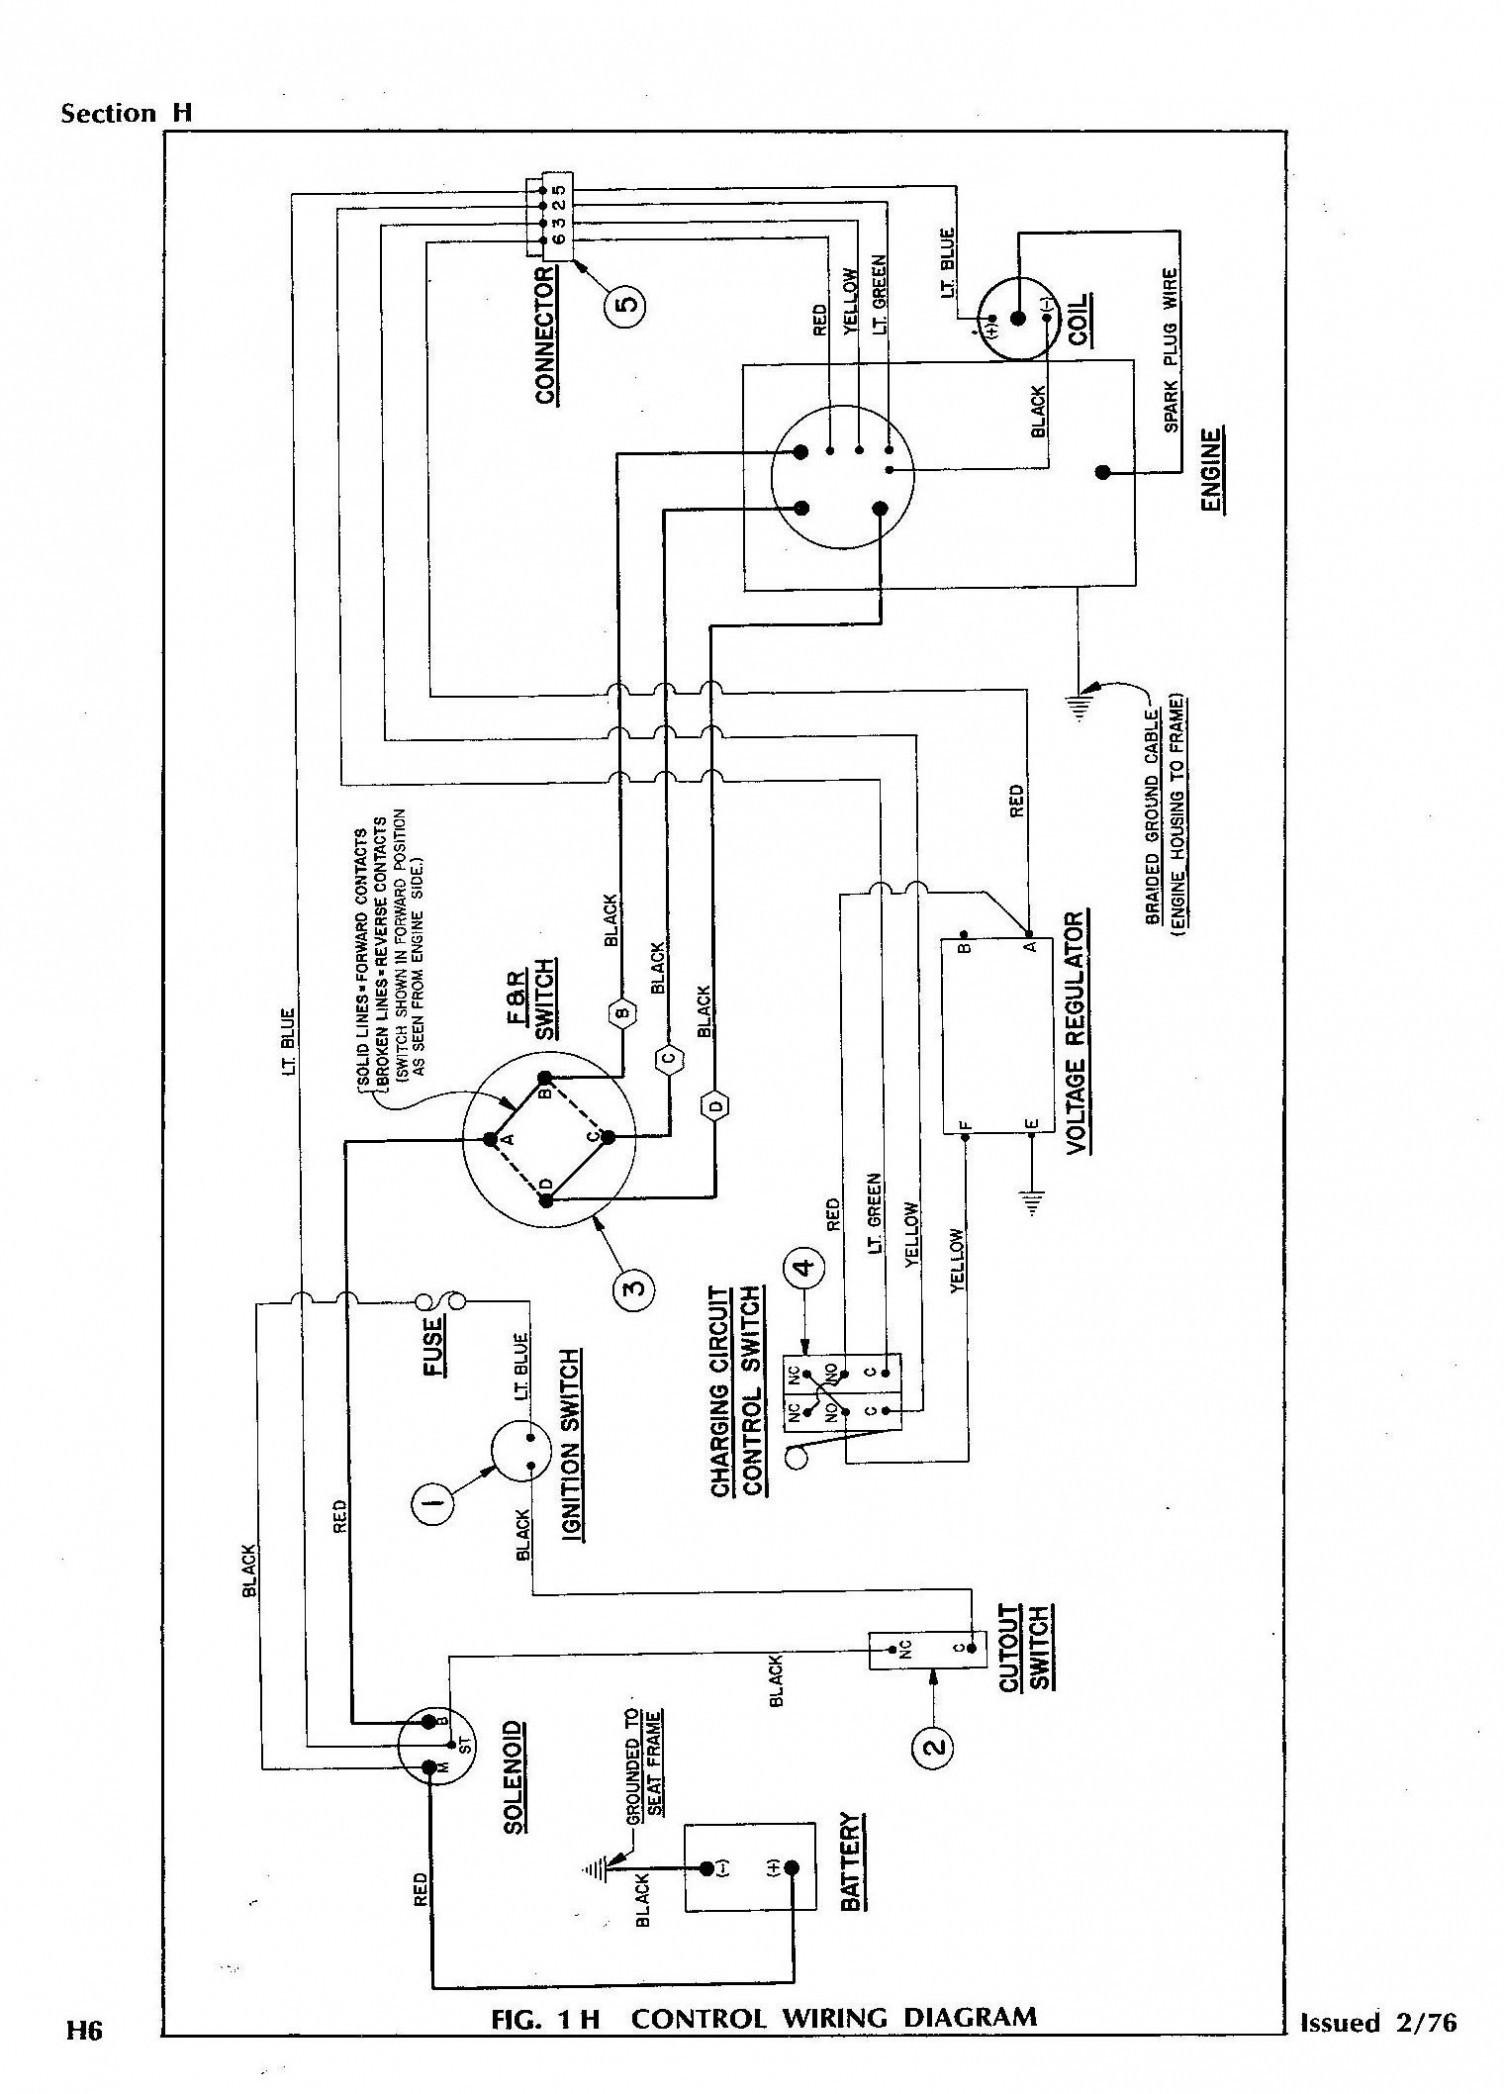 Wiring Diagrahm for 1988 Club Car Golf Cart Ds 6087] 36 Volt Club Car Wiring Diagram Schematic Of Wiring Diagrahm for 1988 Club Car Golf Cart